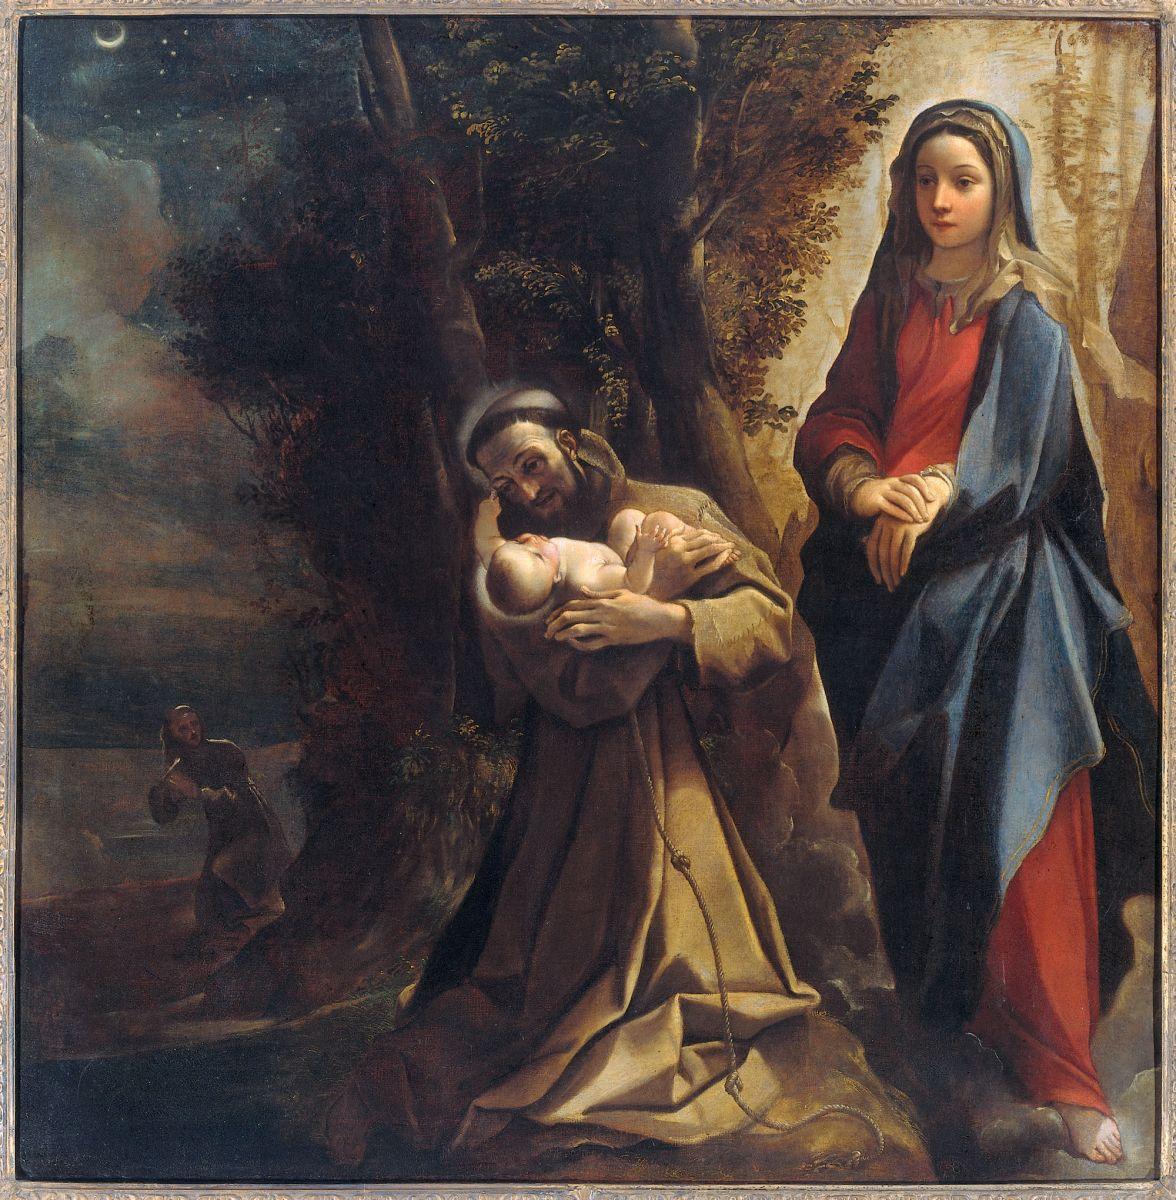 Citaten Franciscus Van Assisi : Gedenkdag heilige franciscus van assisi dierendag